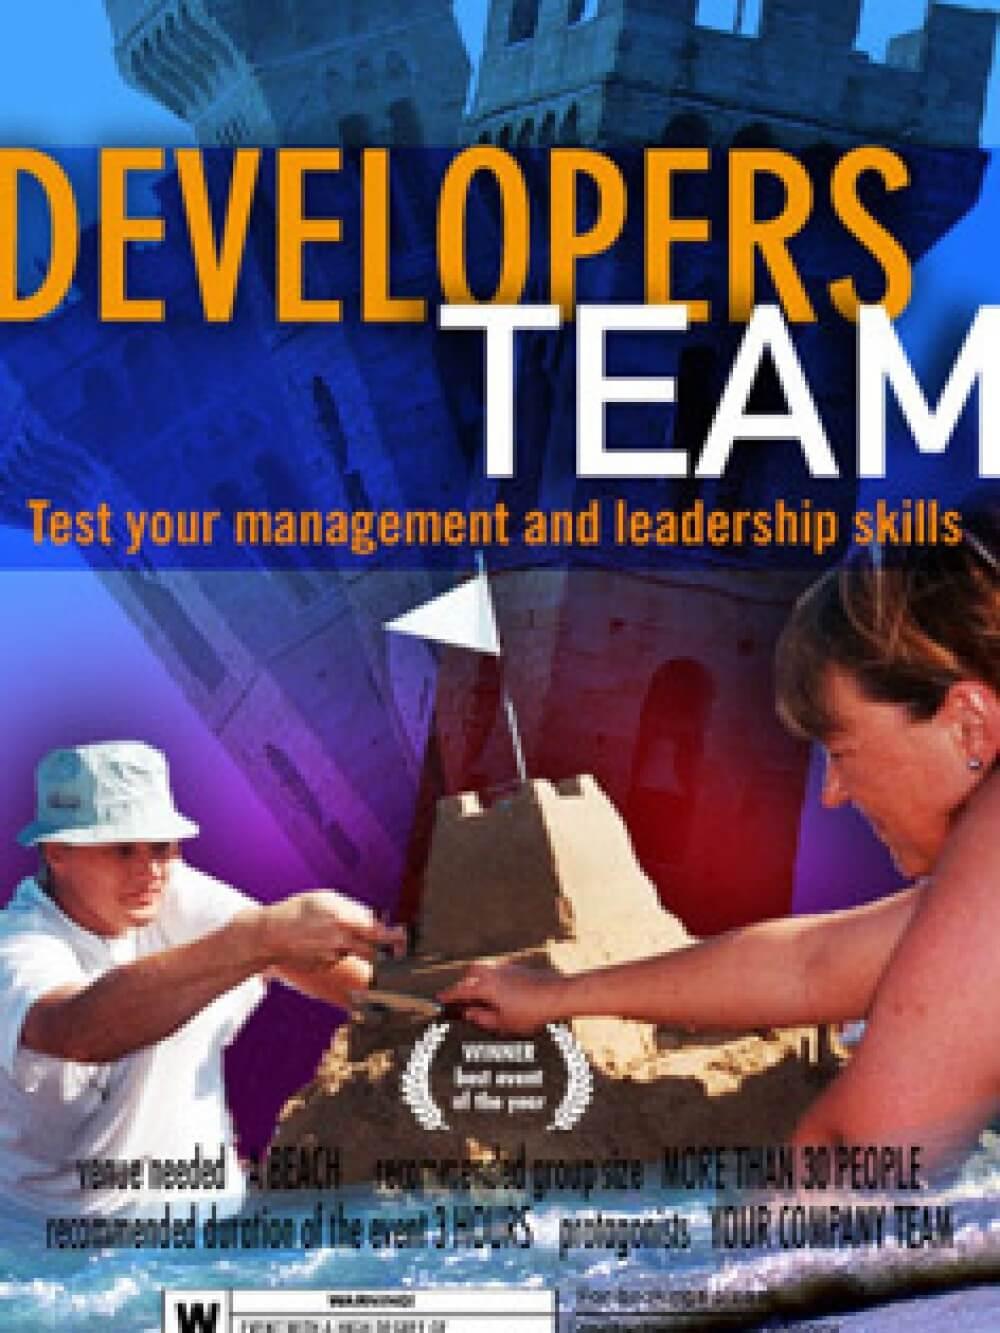 developers_team_vertical_web